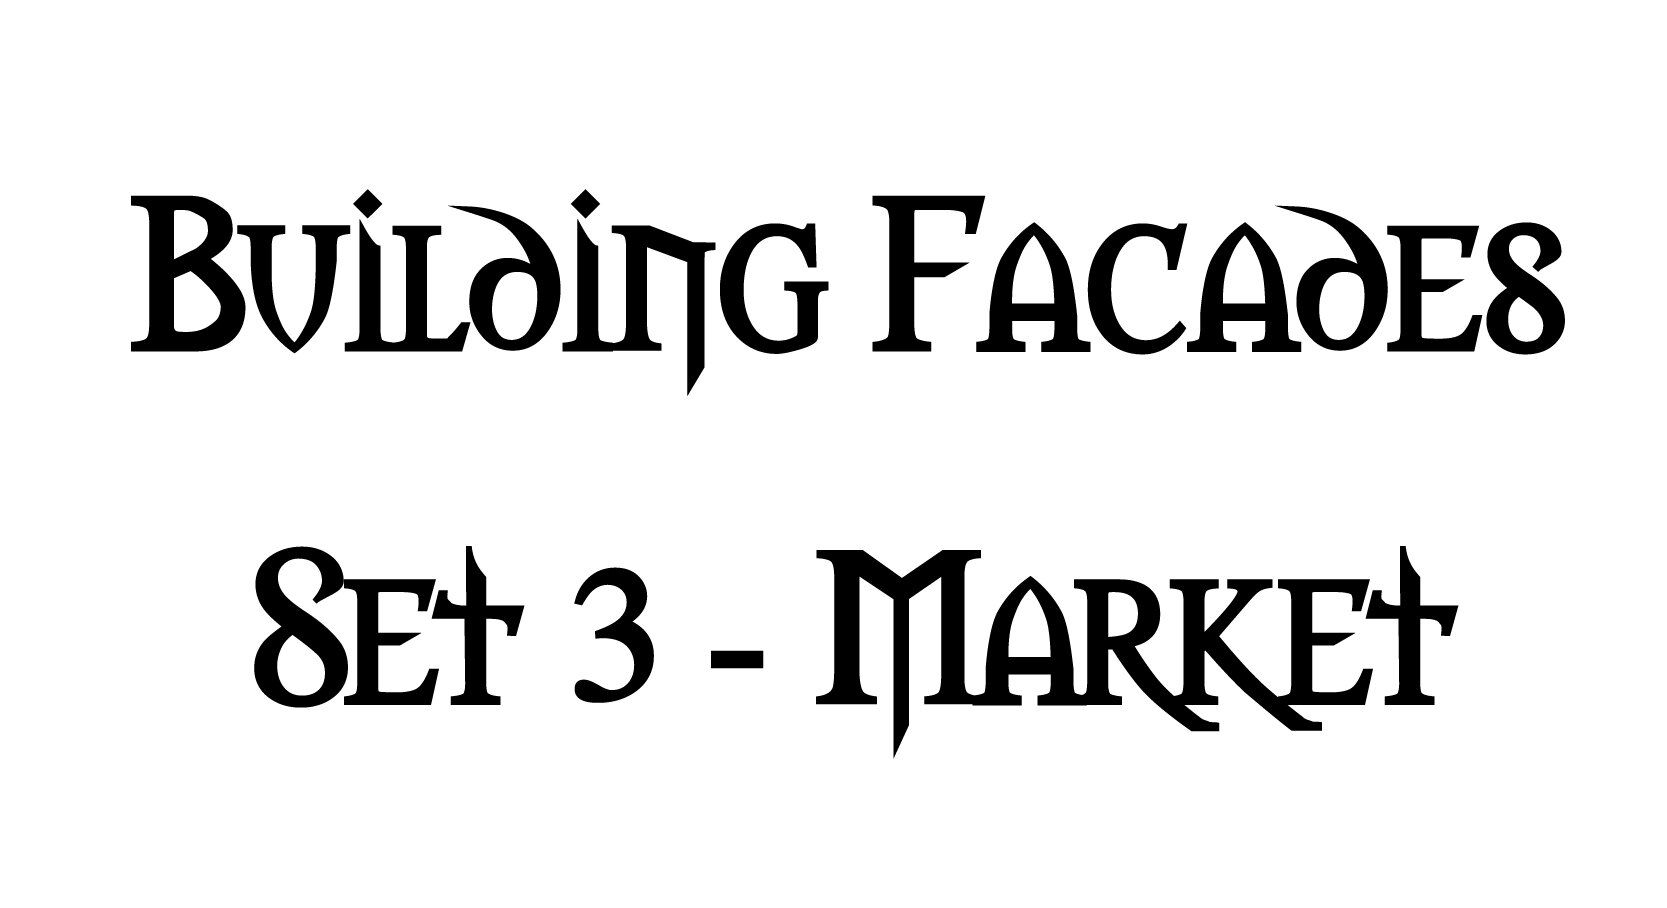 Building Facades set 3.jpg